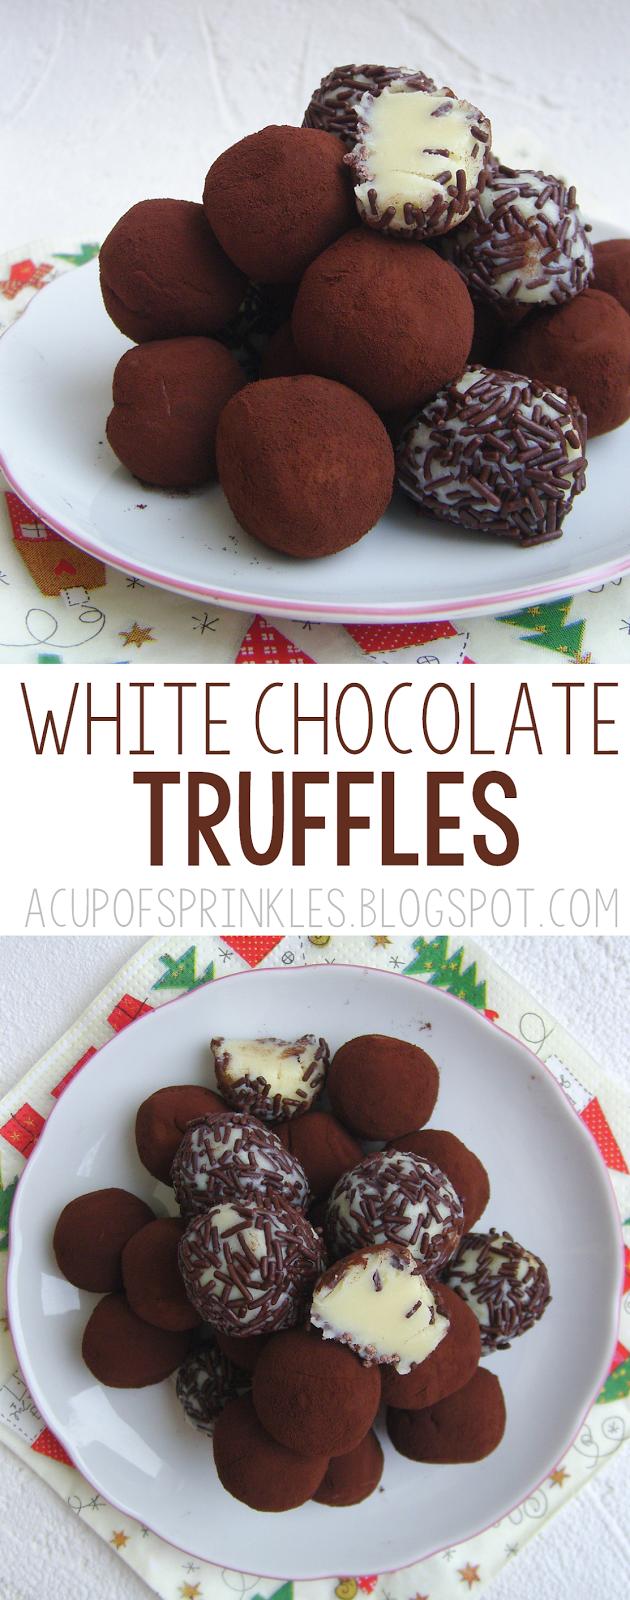 White Chocolate Truffles no bake 4 ingredients